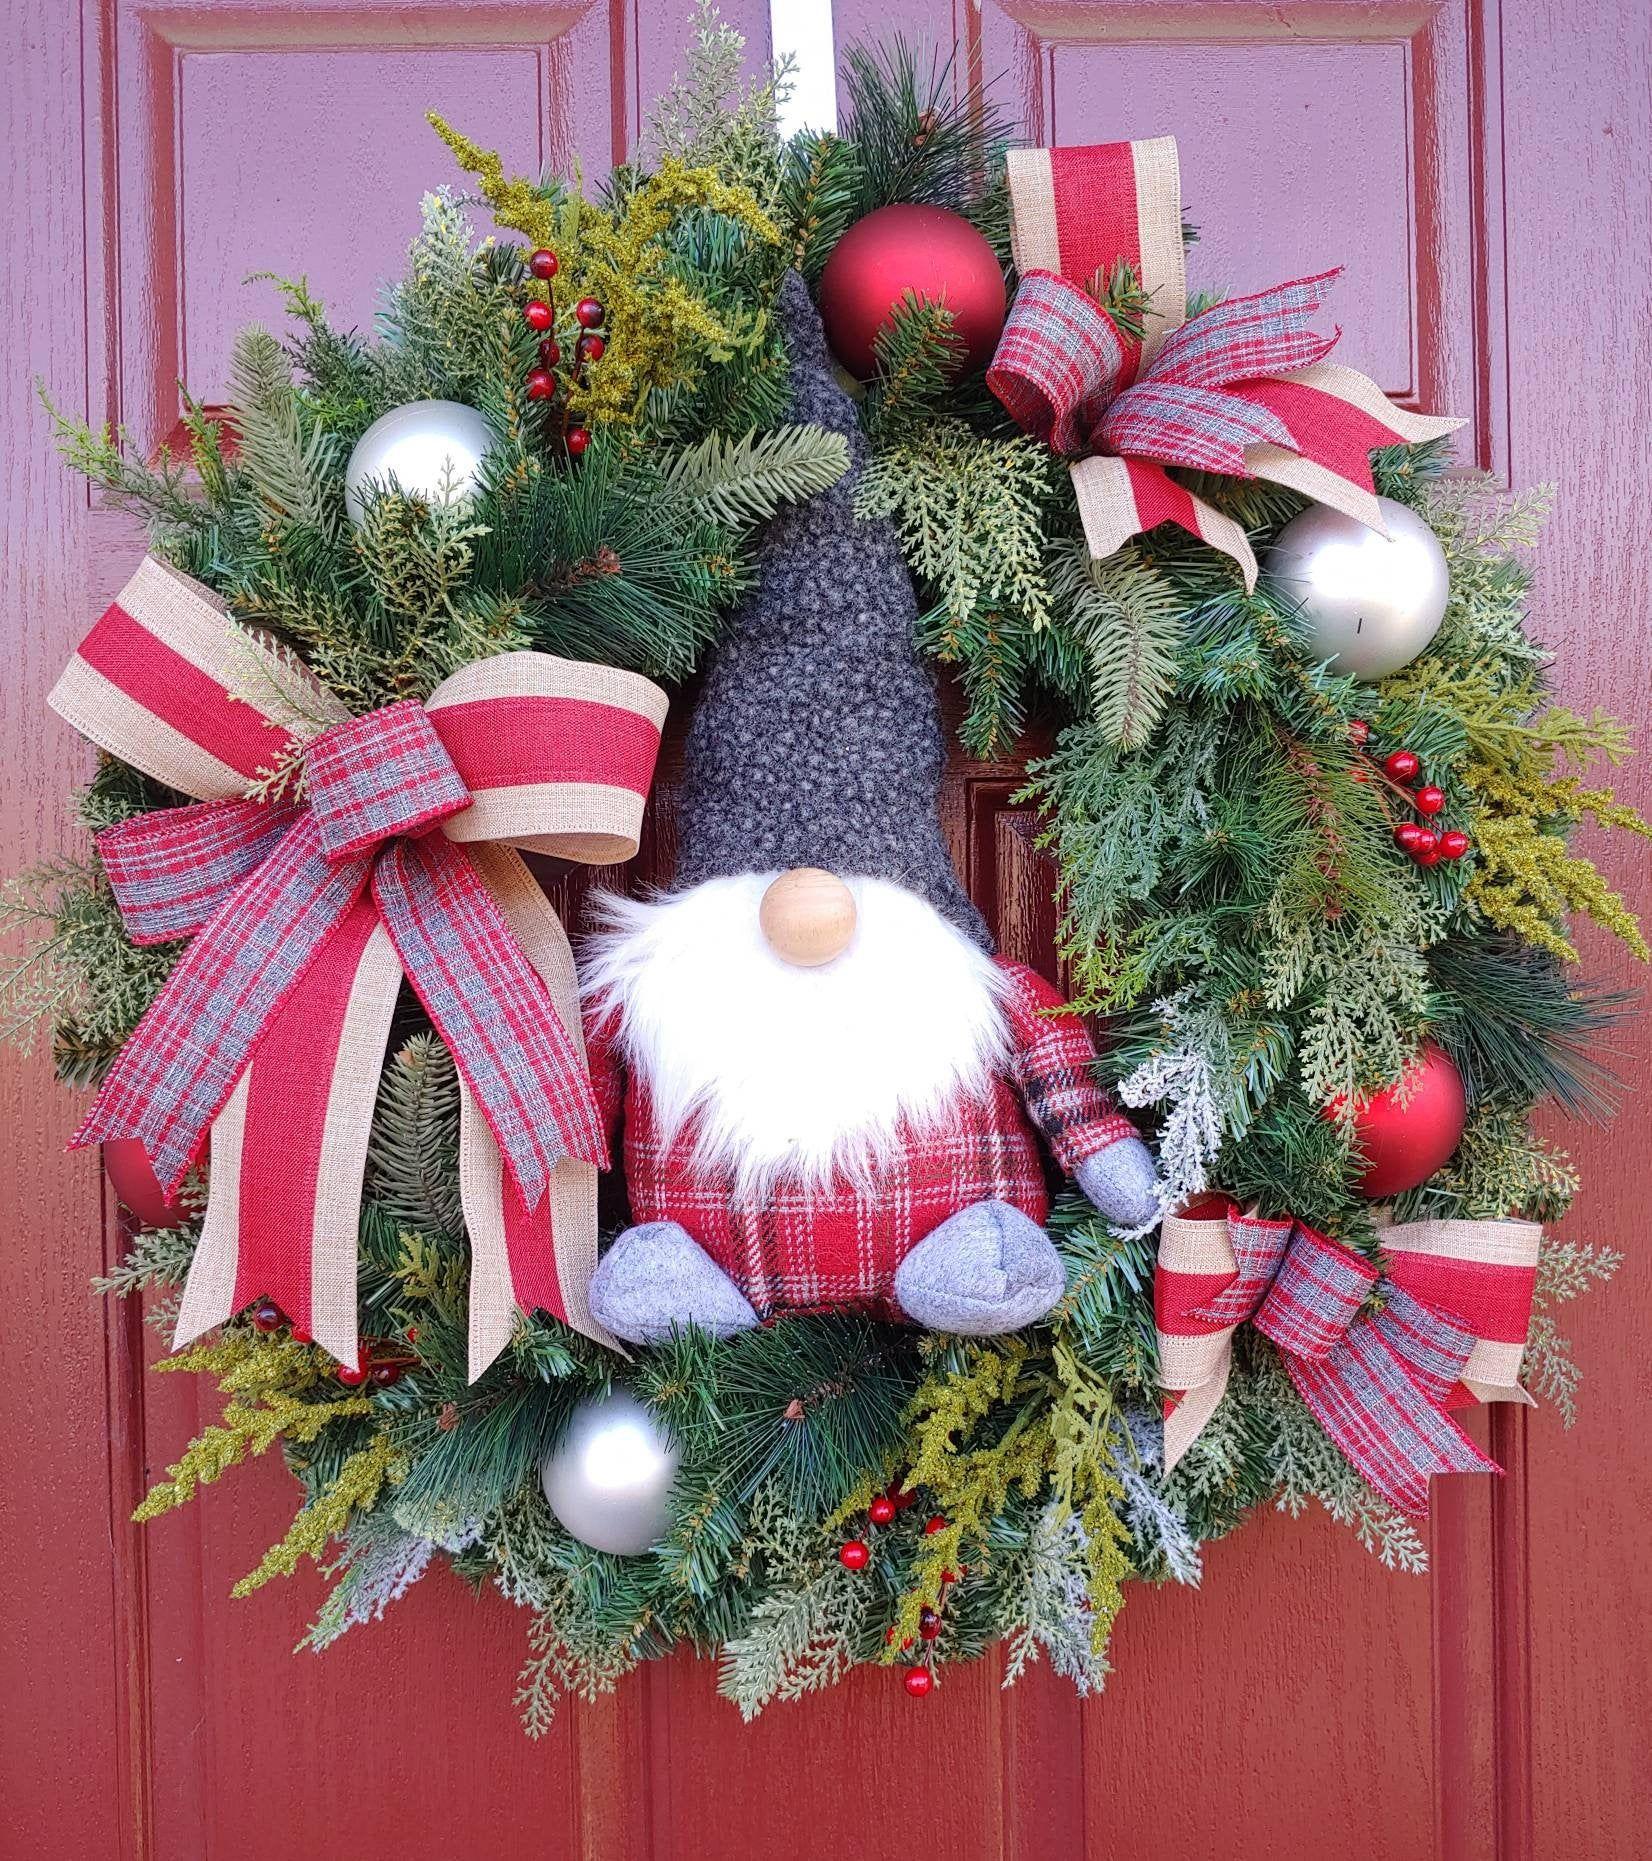 Gnome Wreath Christmas Wreath Front Door Wreath Gnome Decoration Holiday Decor Unique Xmas Gift Winter Door Hanger Evergreen Christmas Wreaths Christmas Door Decorations Fall Door Decorations